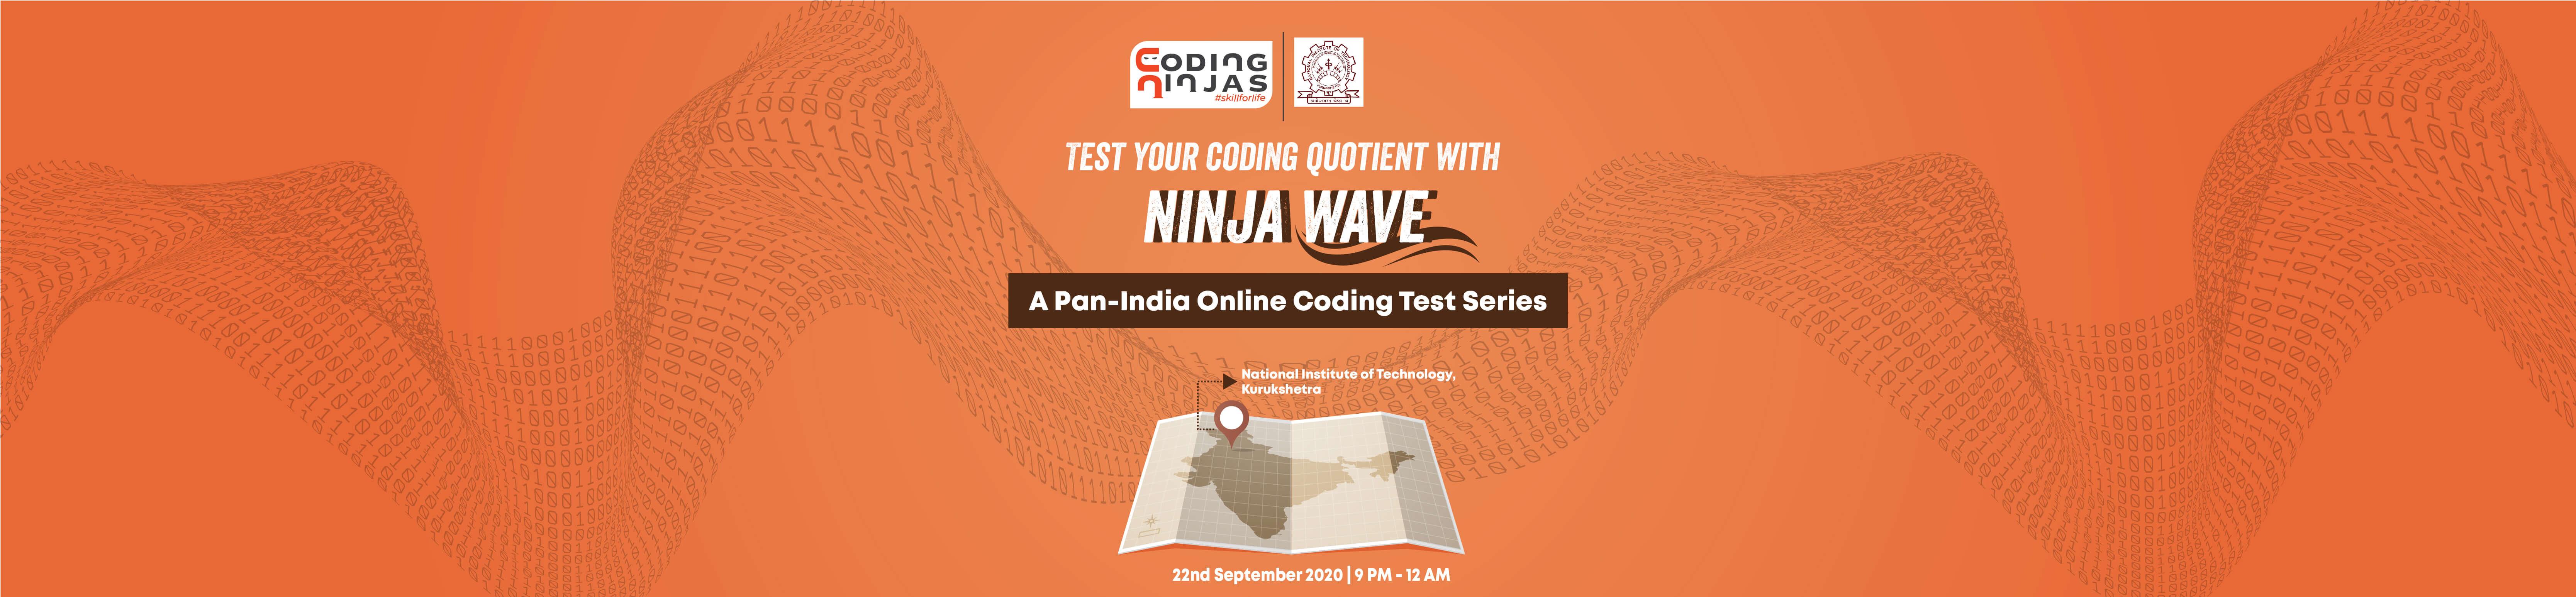 Ninja Wave at National Institute of Technology, Kurukshetra